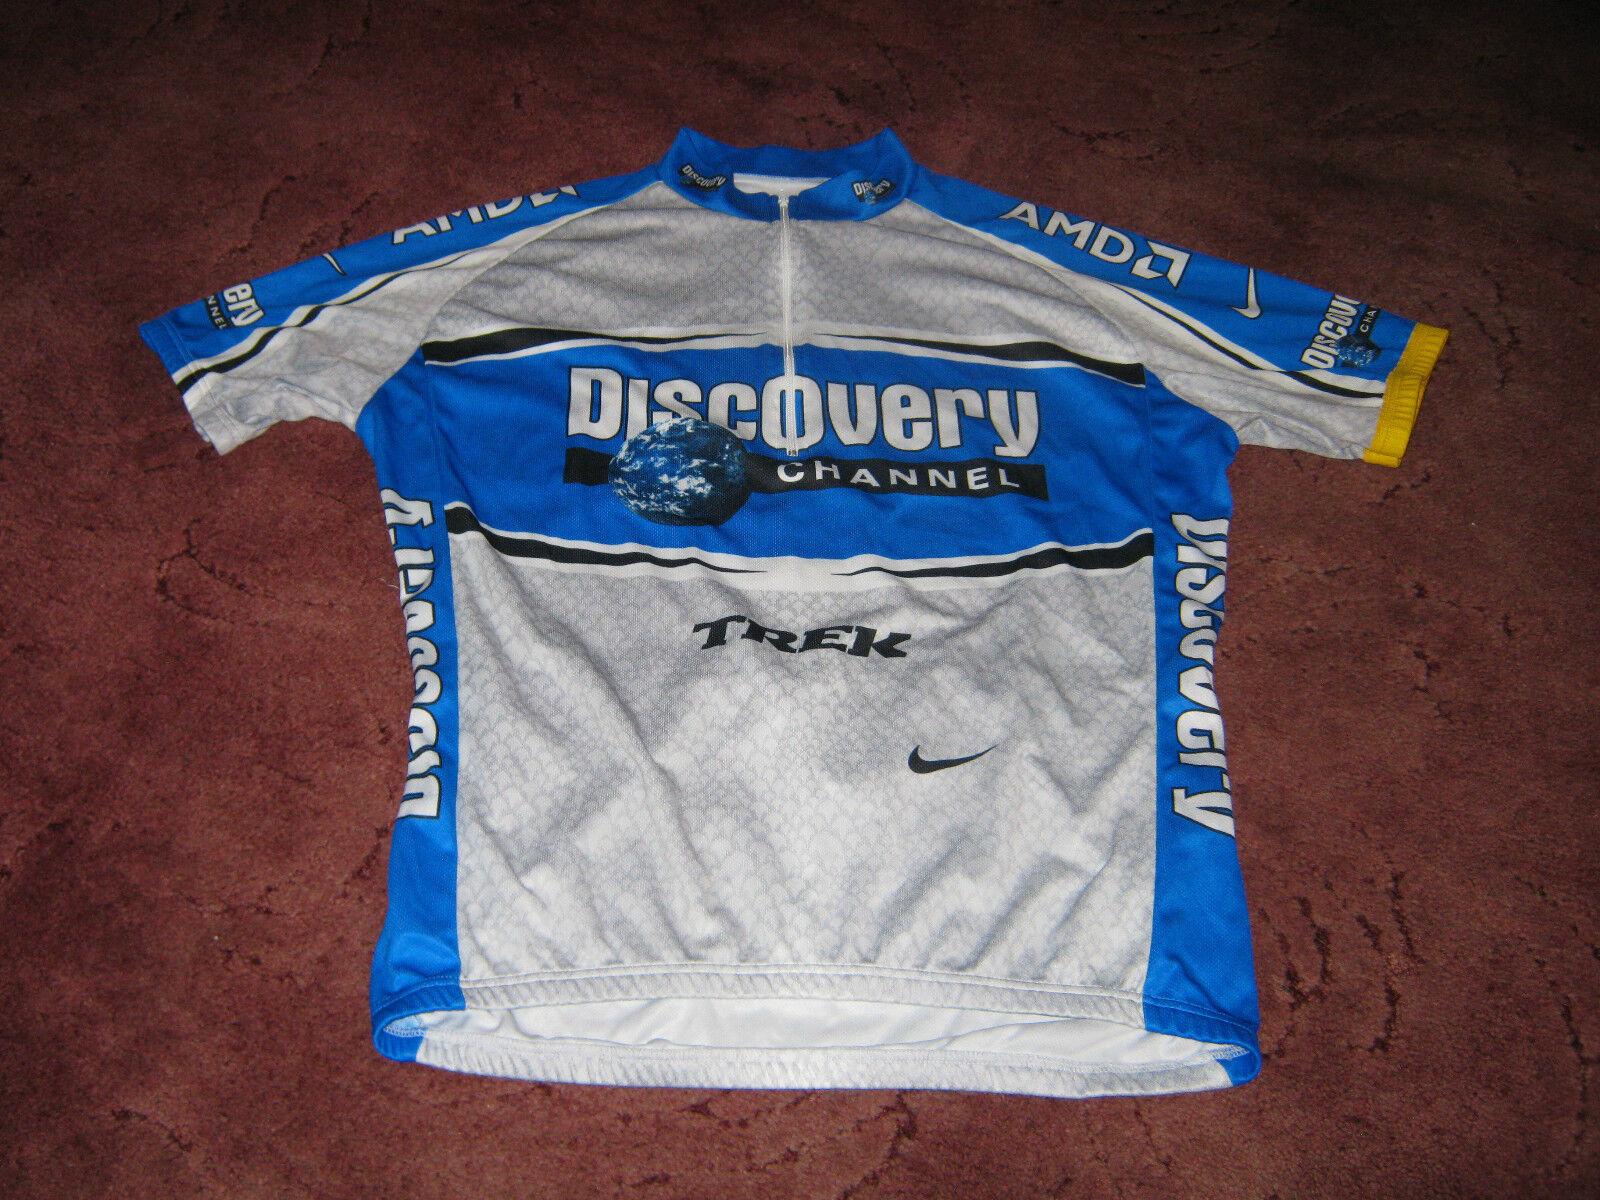 DISCOVERY CHANNEL TREK SUBARU NIKE ITALIAN CYCLING JERSEY [L] .